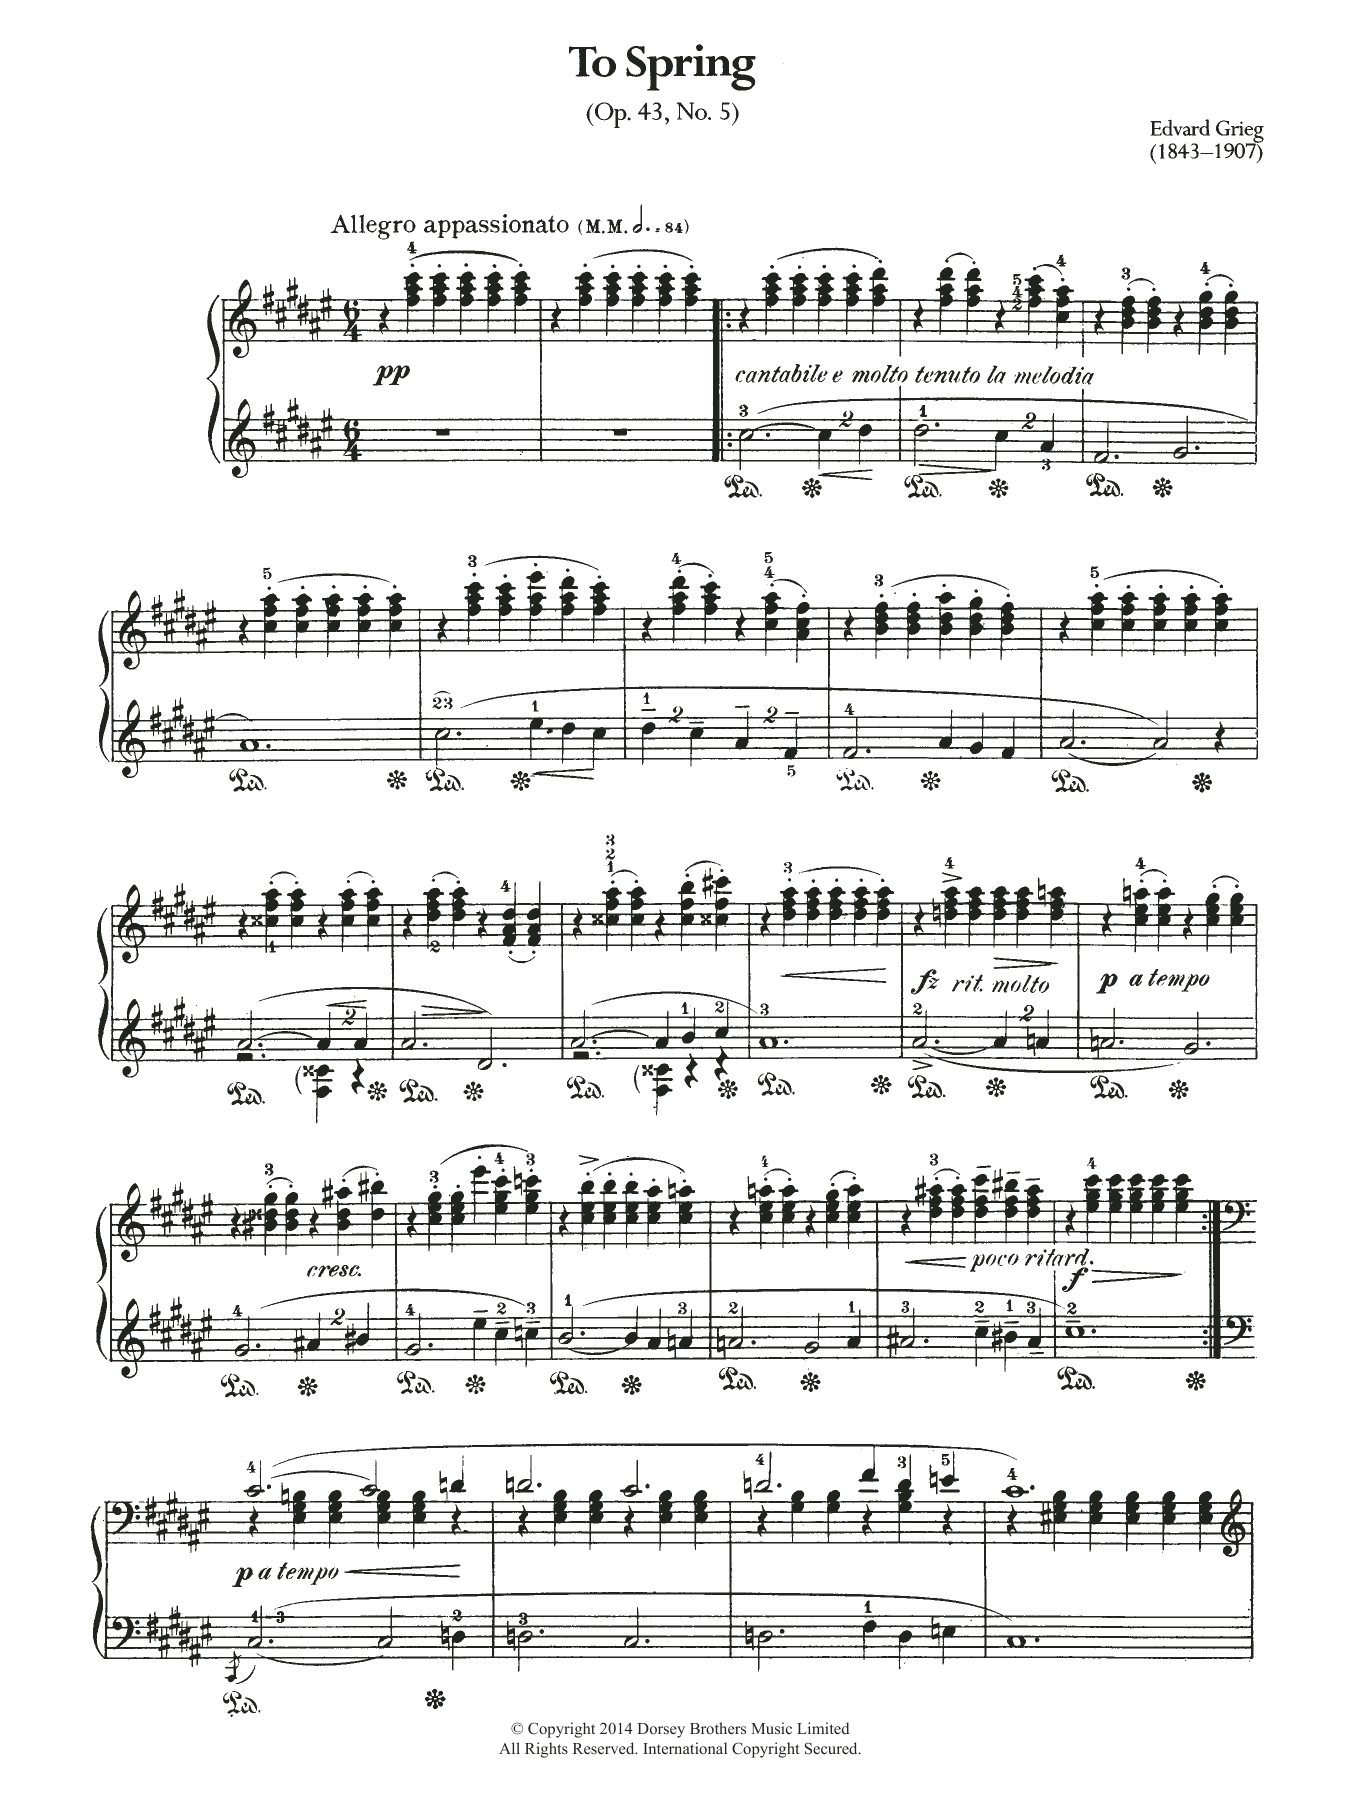 Edvard Grieg - To Spring, Op.43 No.5